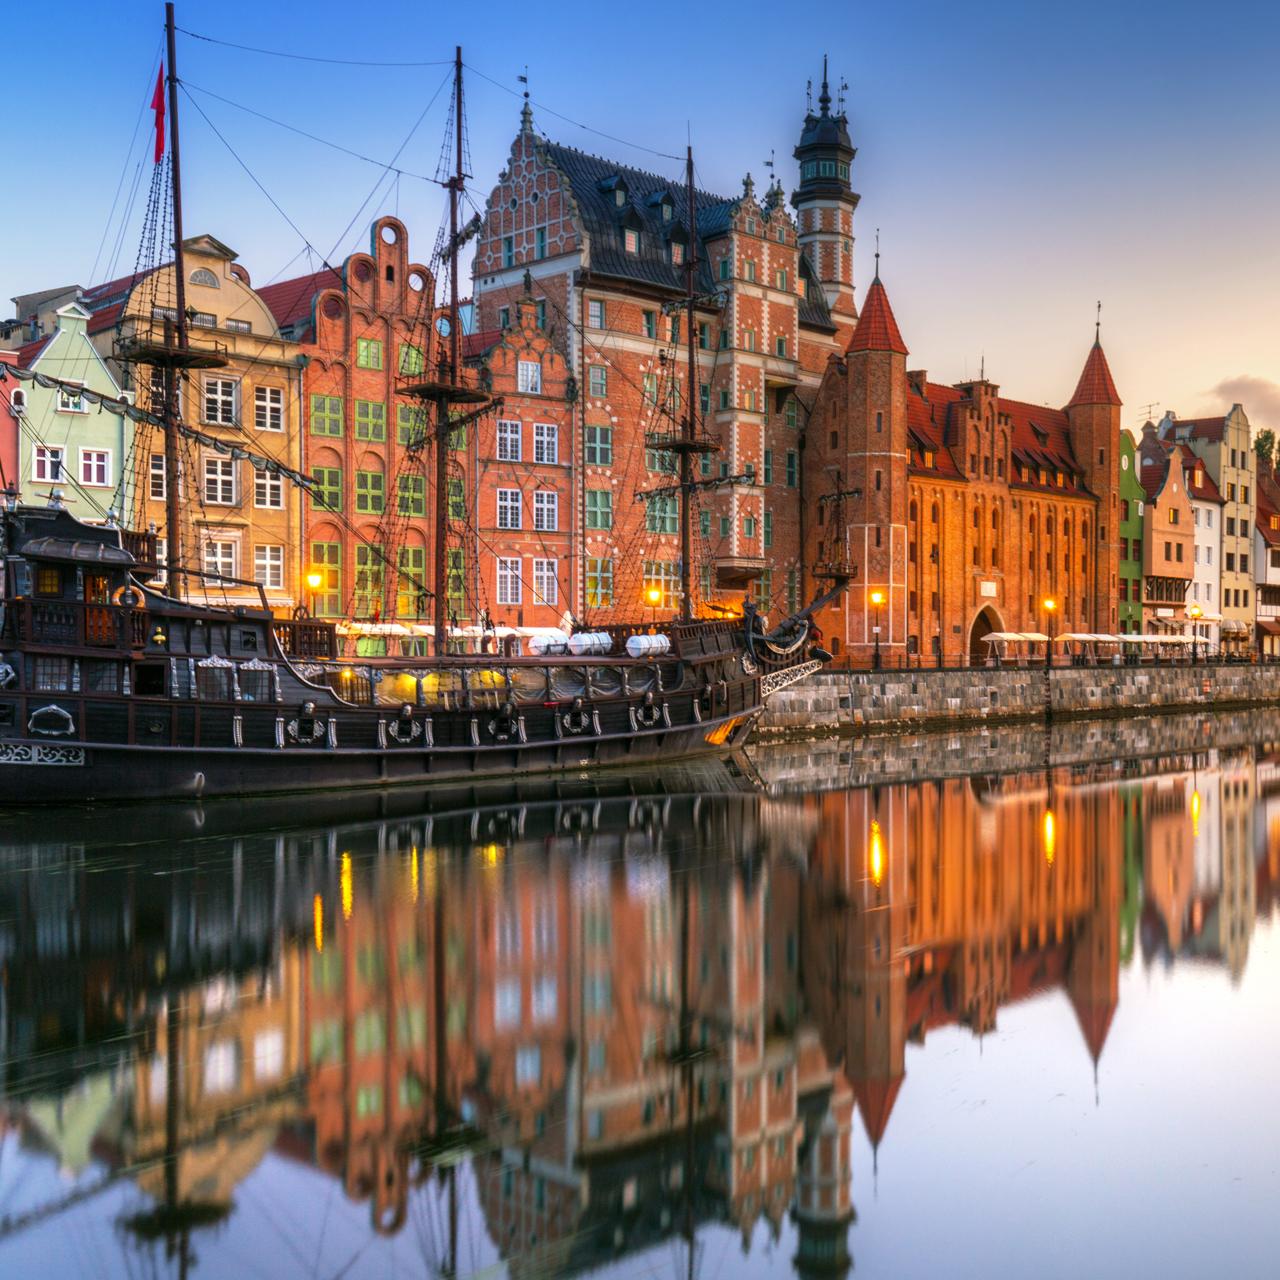 Kanalen i Gdansk